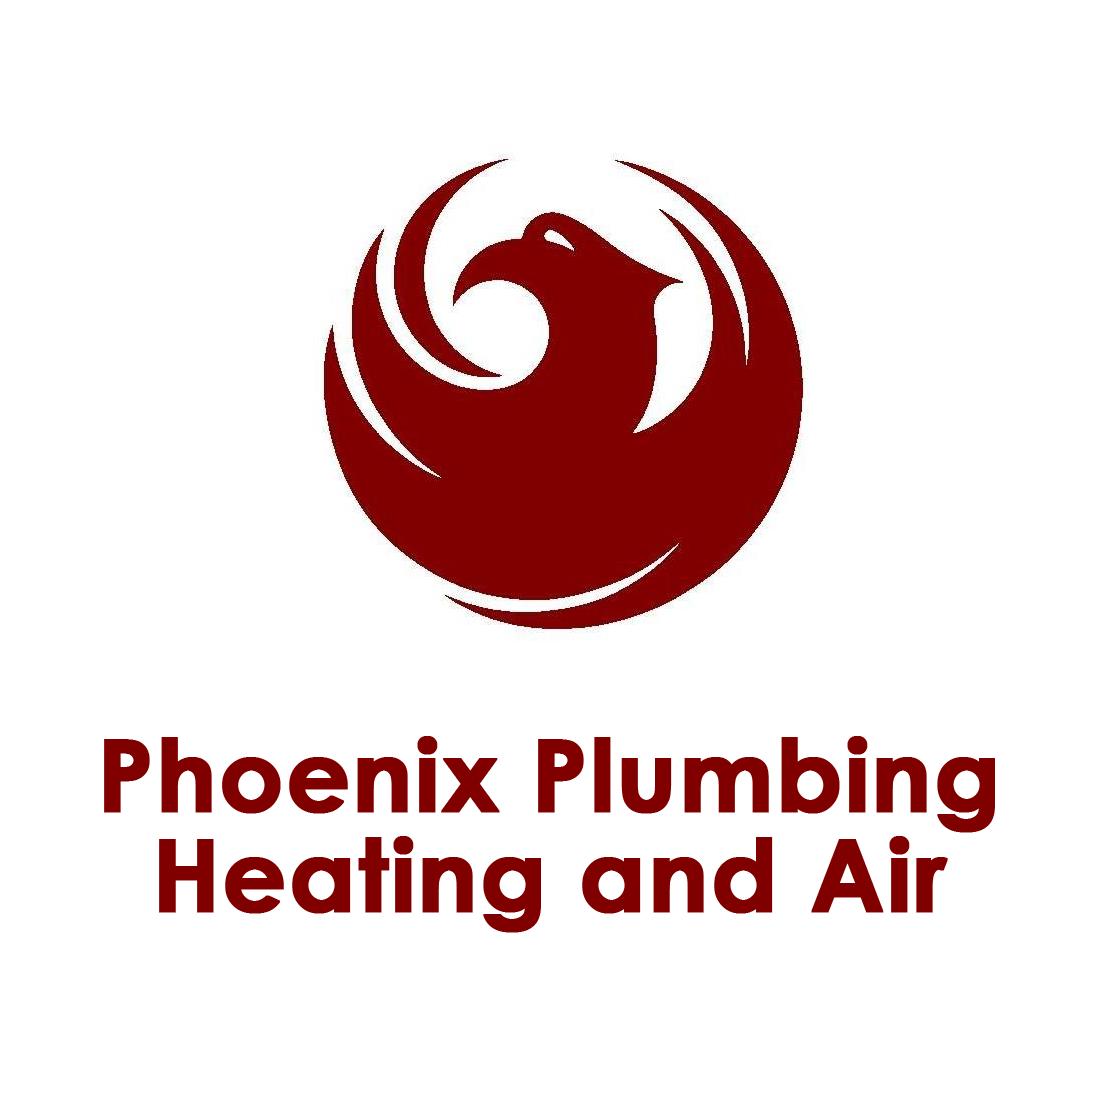 Phoenix Plumbing Heating and Air